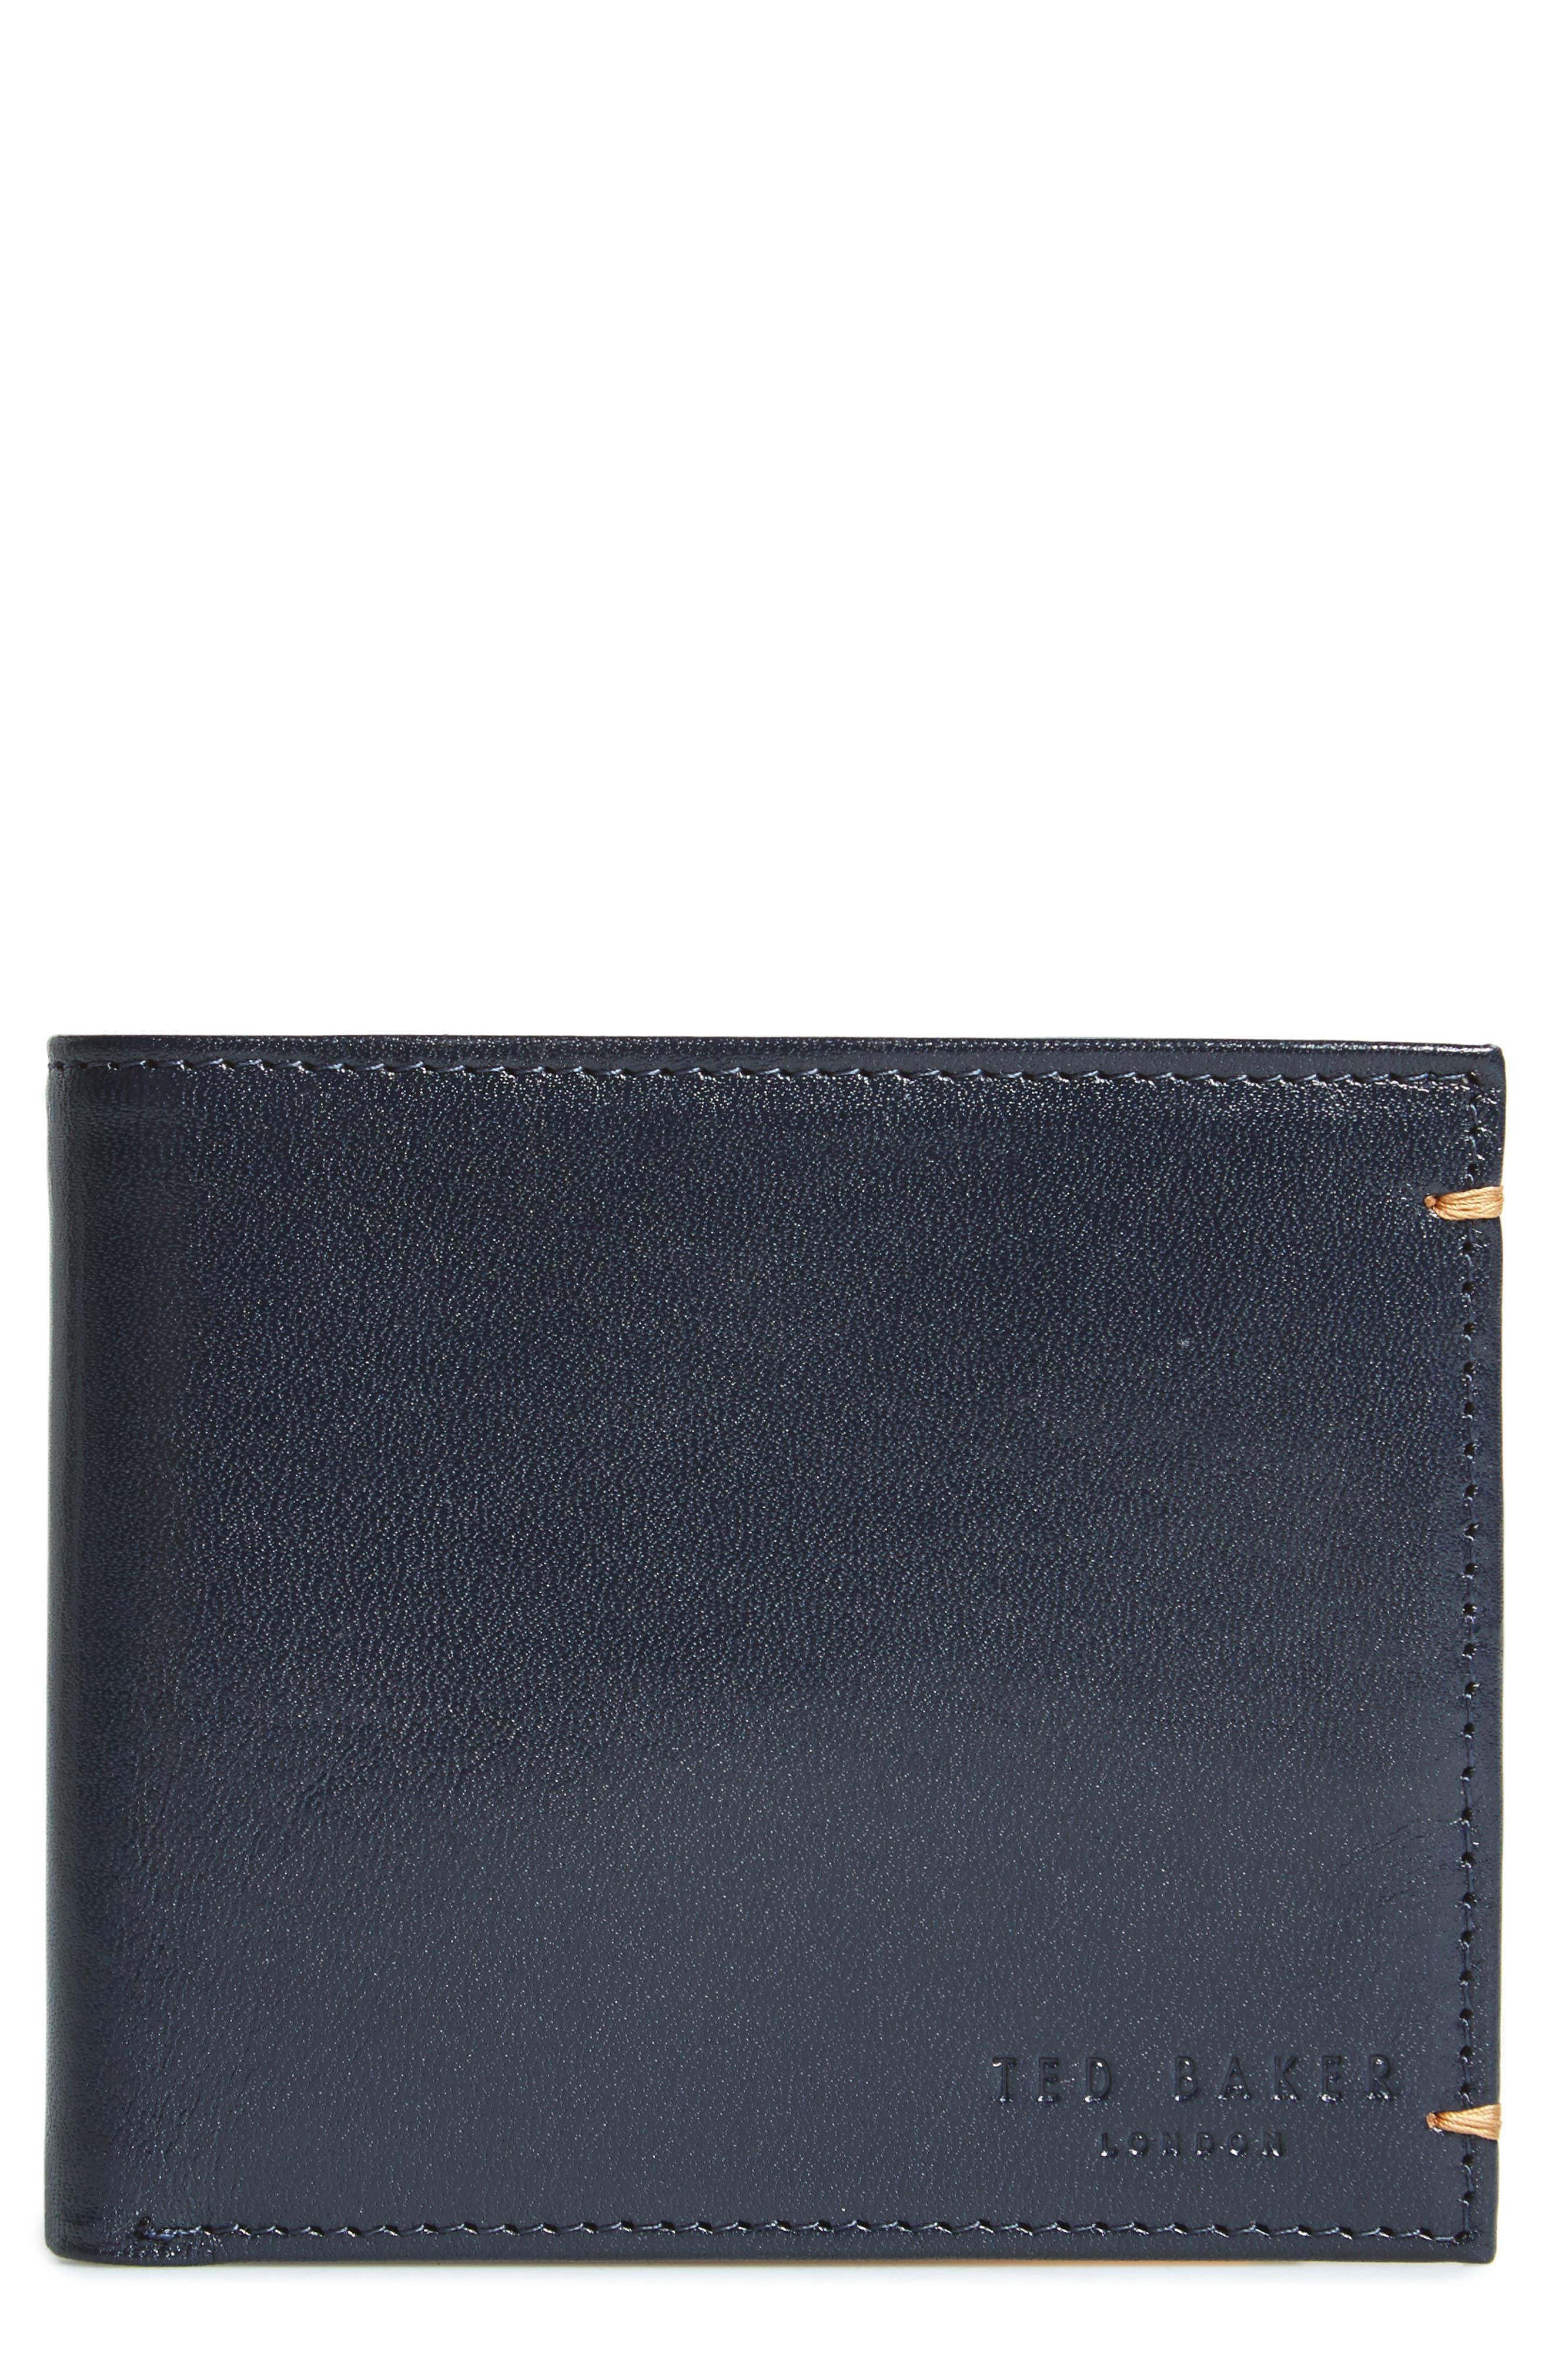 TED BAKER LONDON Vivid Leather Wallet